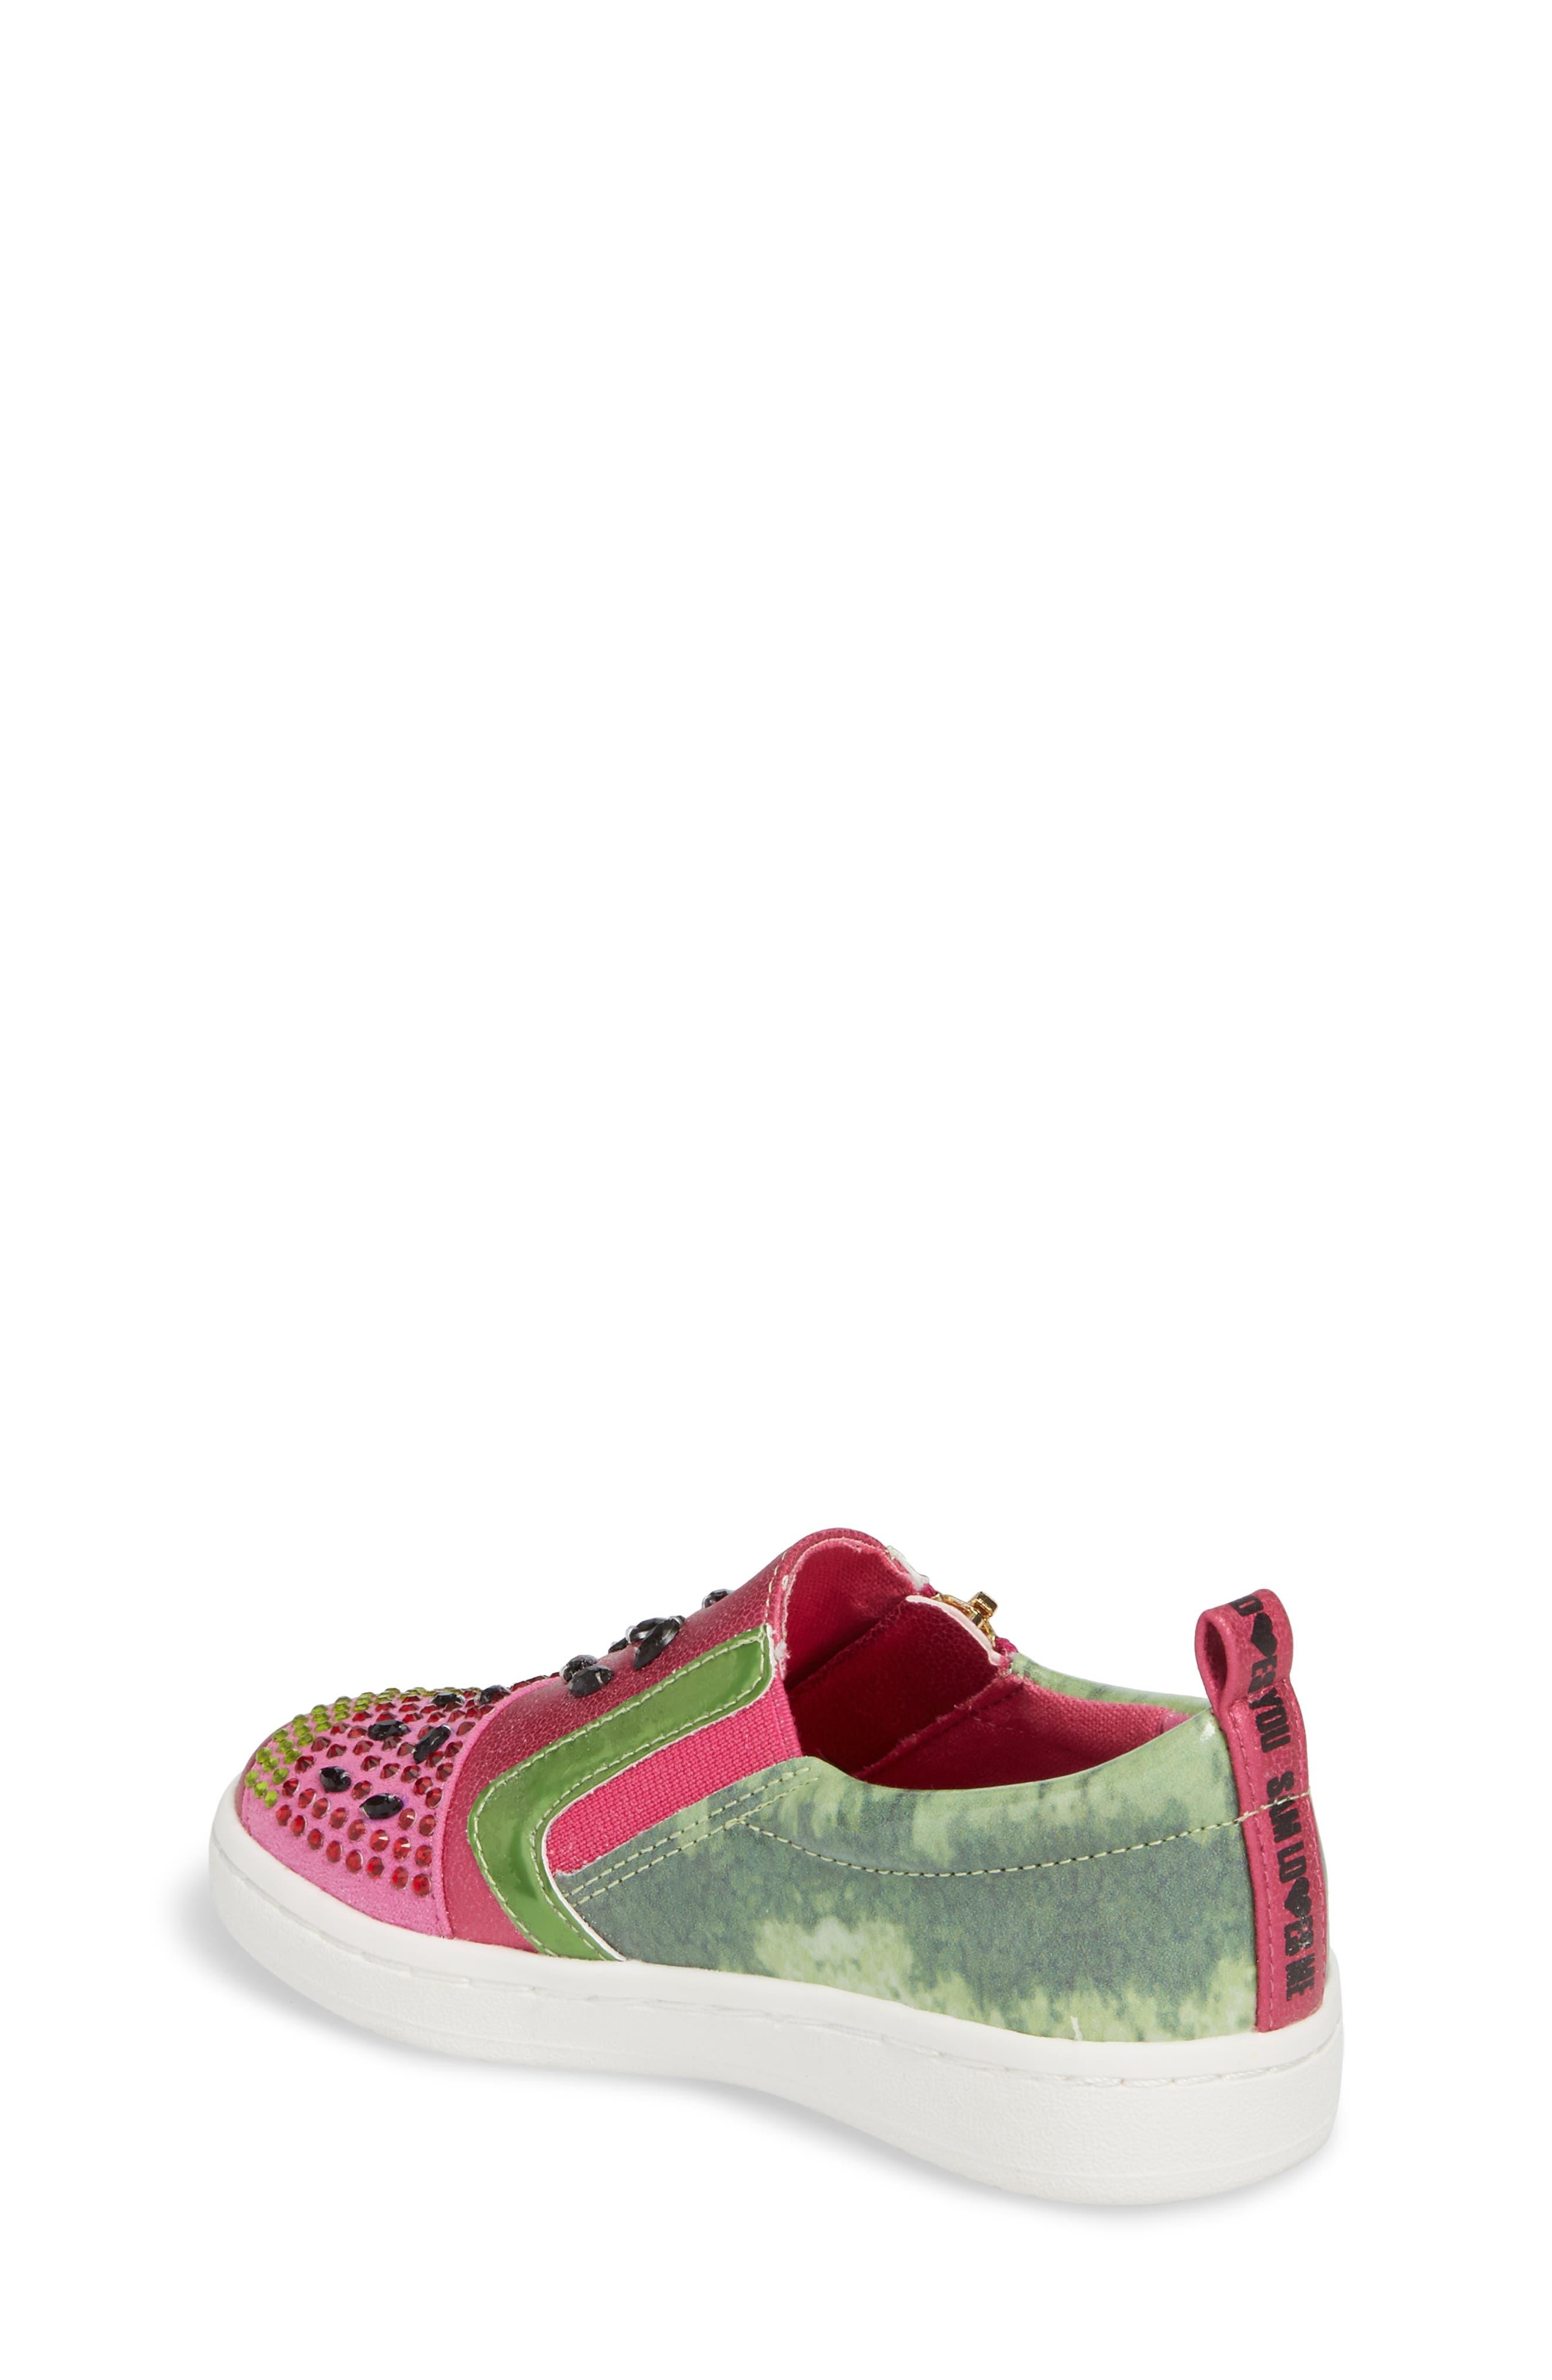 Blane Watermelon Sneaker,                             Alternate thumbnail 2, color,                             653